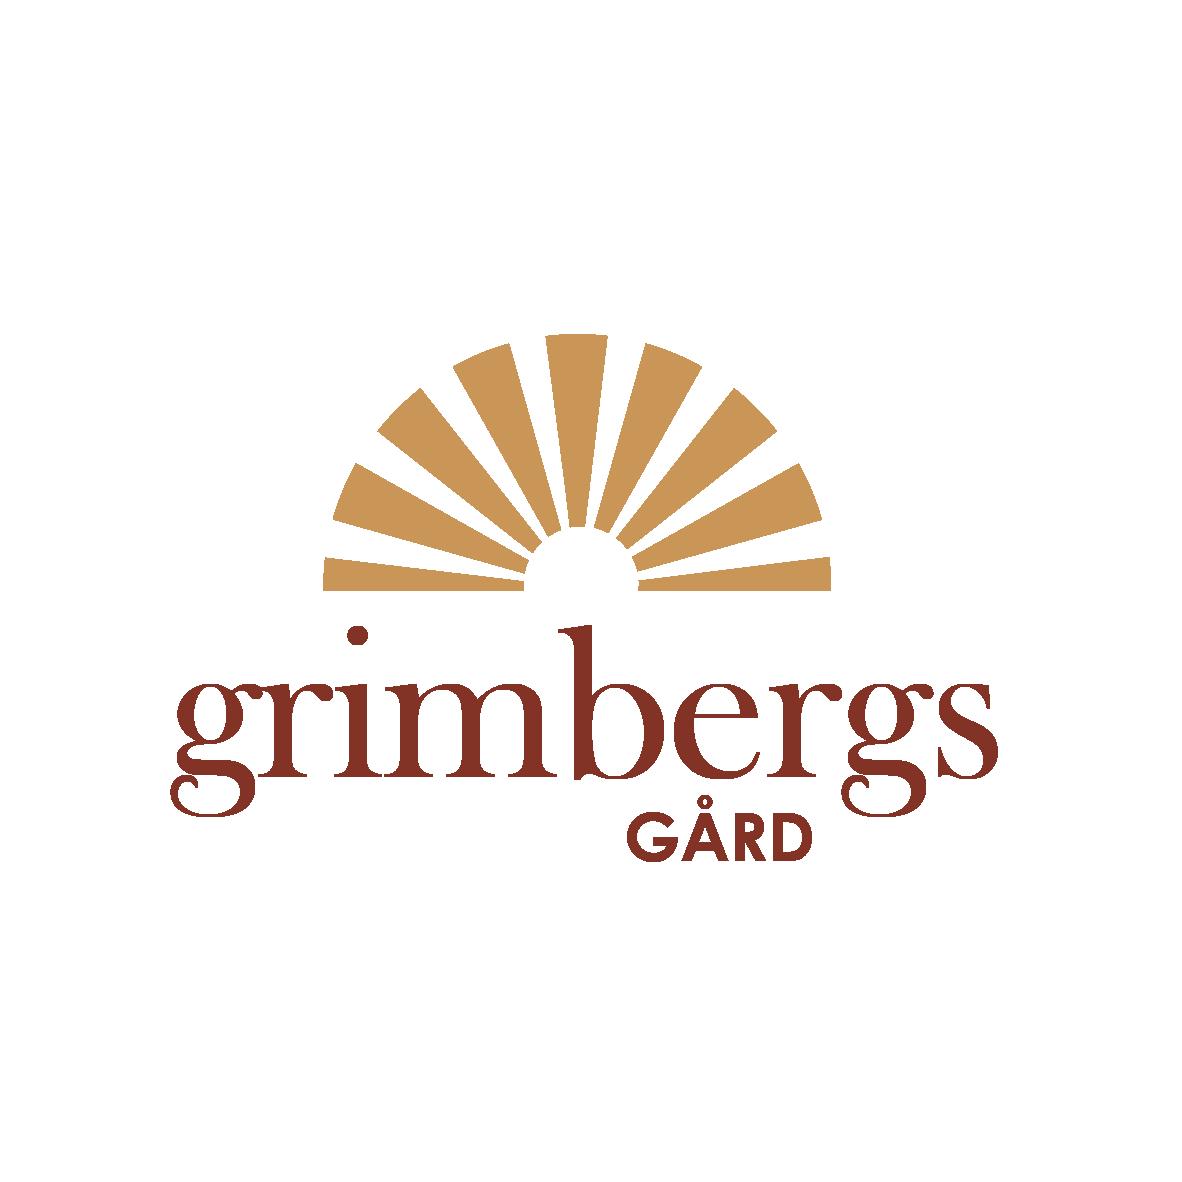 Grimbergs Gård